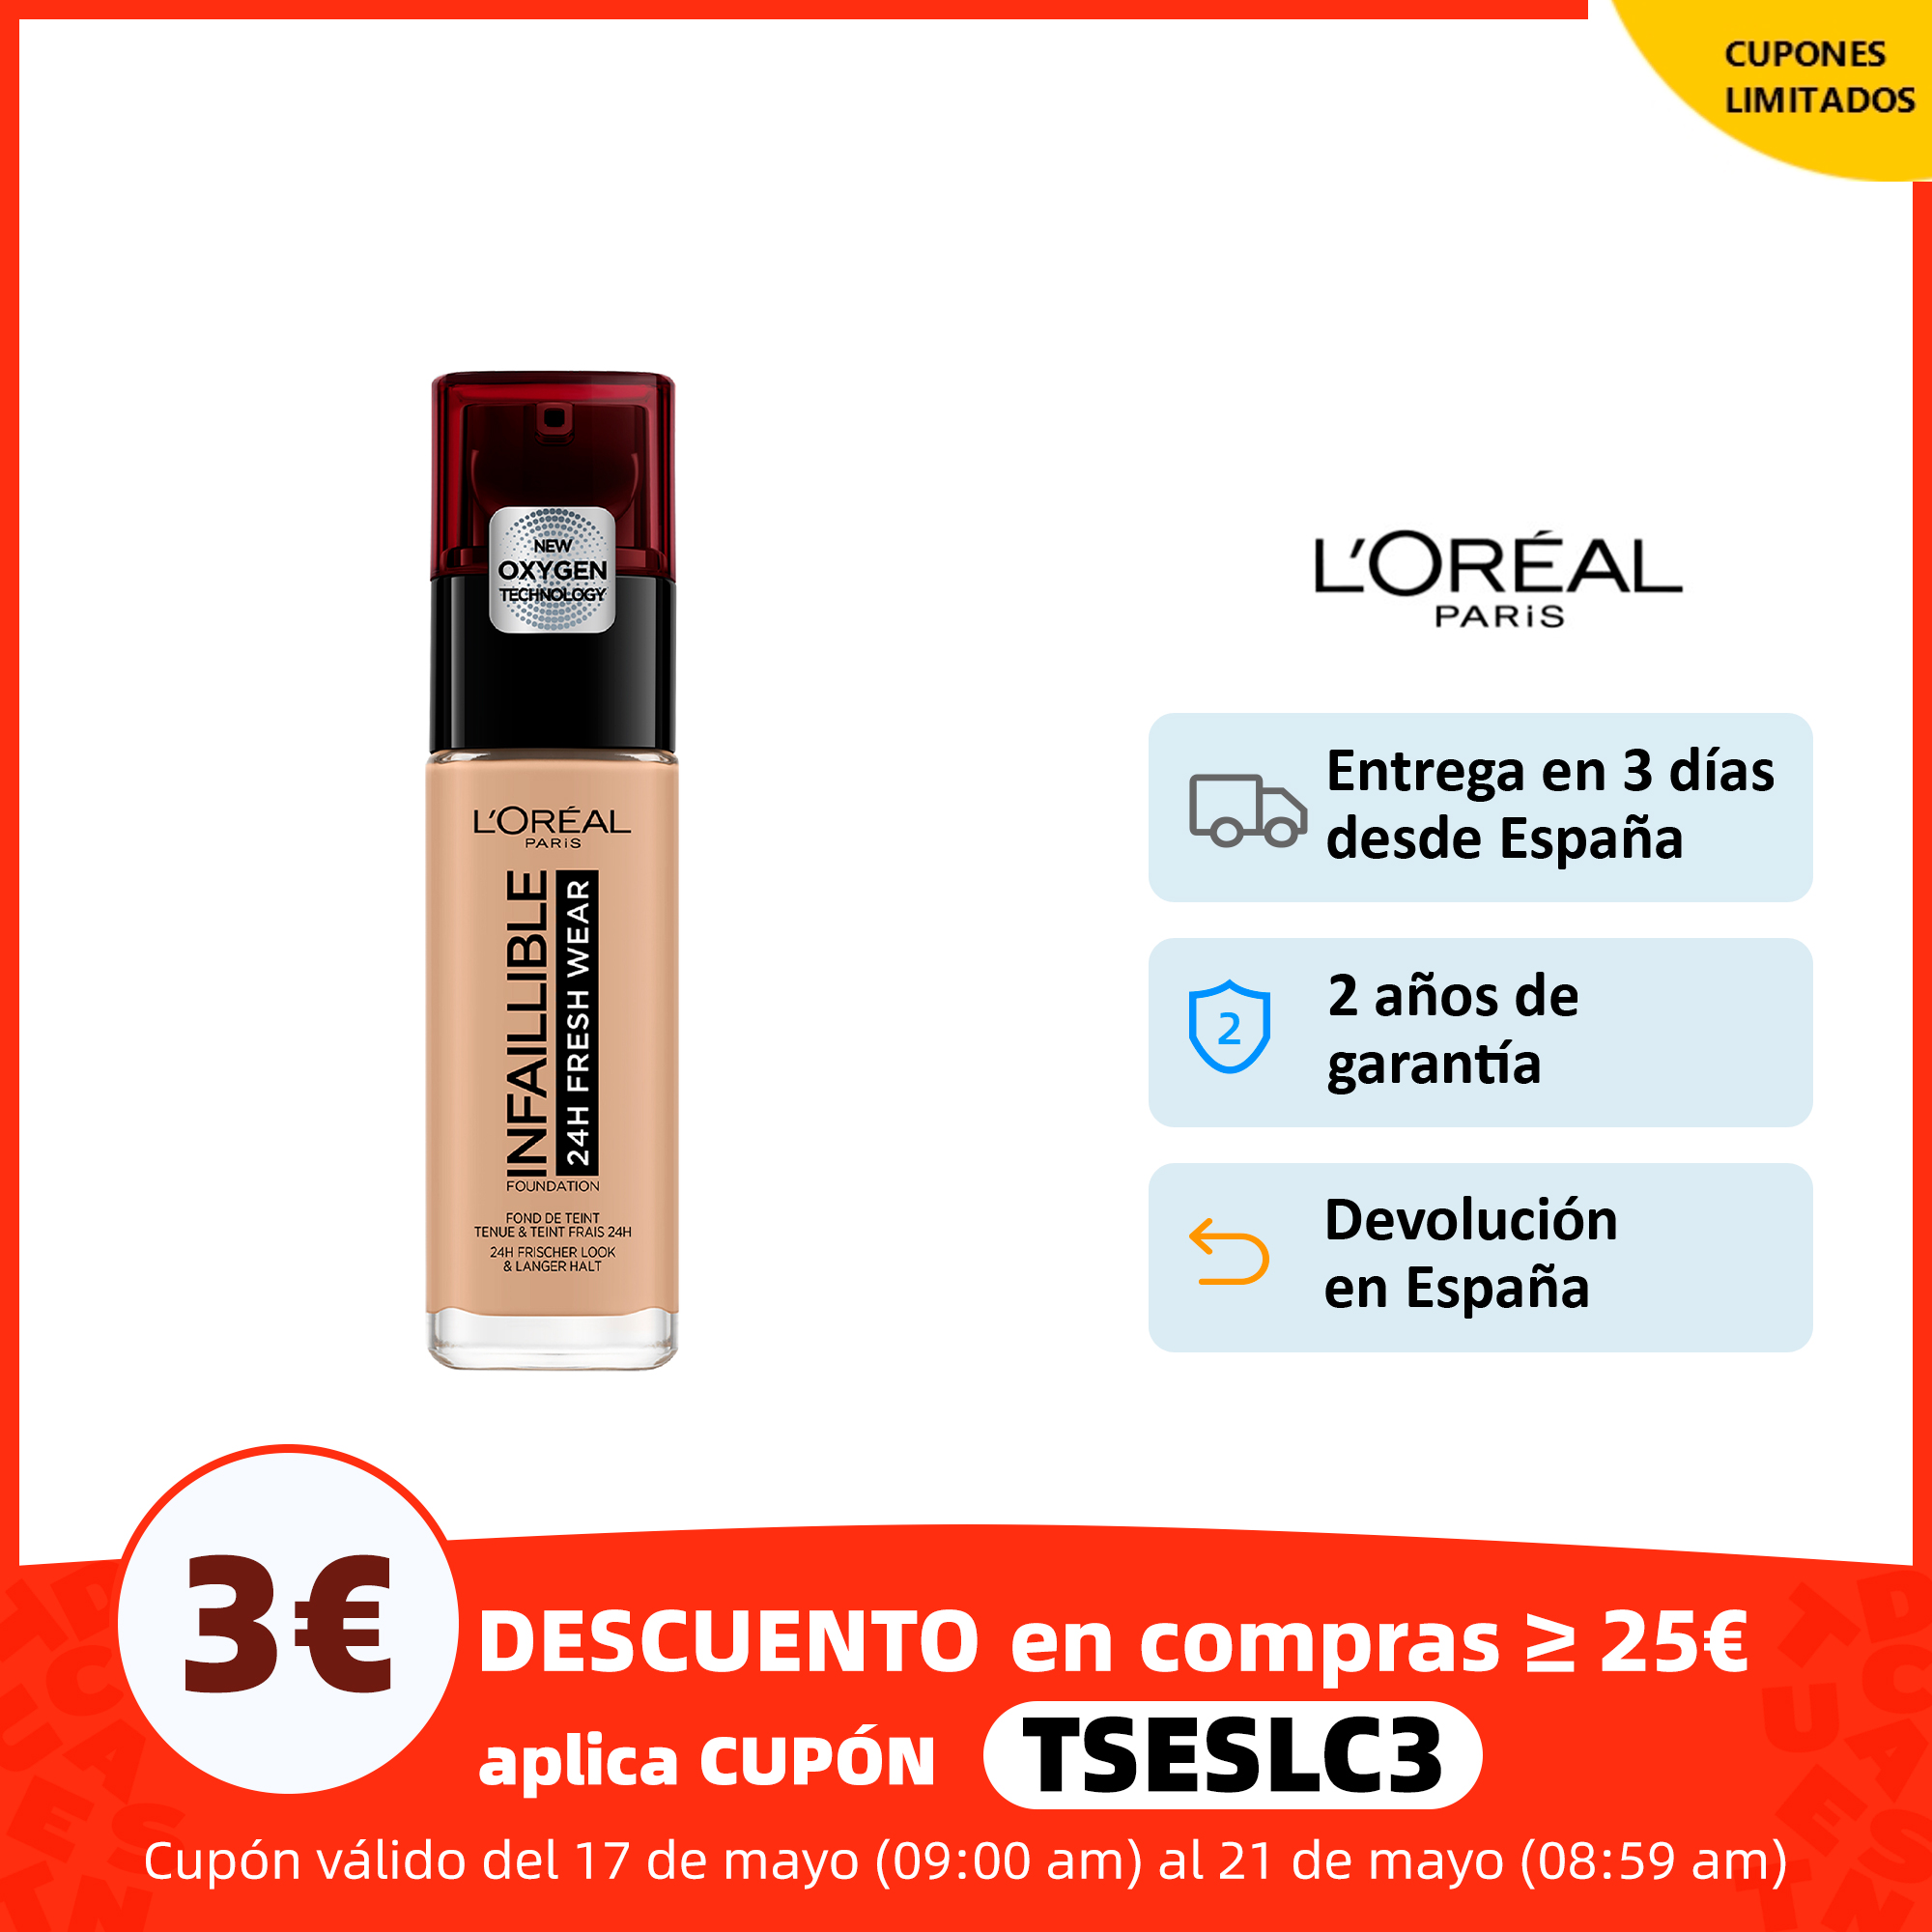 L'Oréal Paris Infalible 24H Fresh Wear Base Maquillaje de Larga Duración. Tonos 125, 200, 140 , 230, 130, 220, 300 y 225 30 ml|Base de maquillaje| - AliExpress